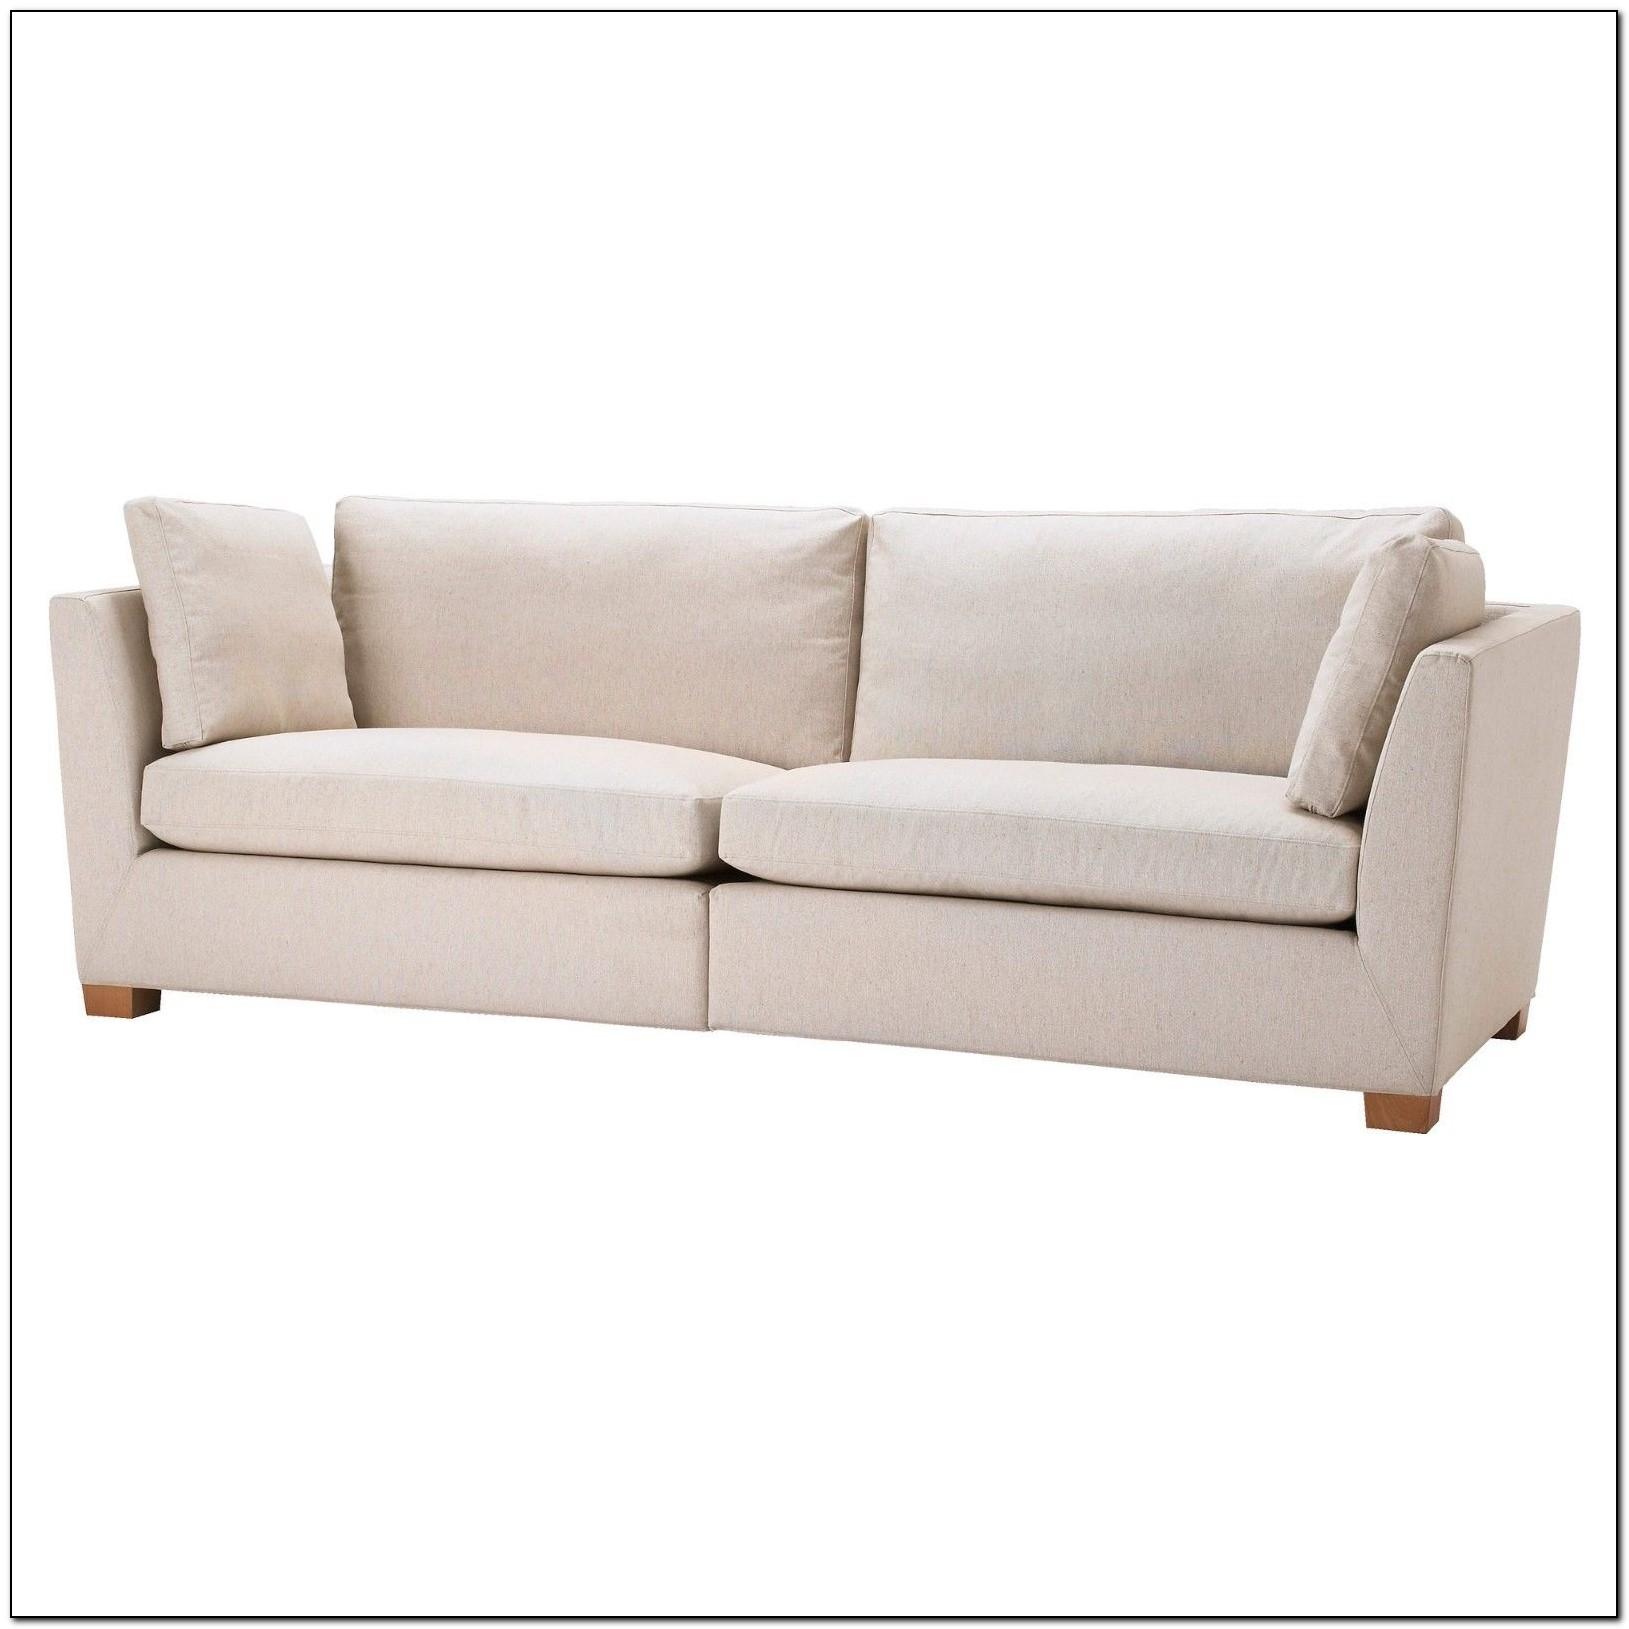 ikea white slipcover sofa large pillows slipcovers home design ideas